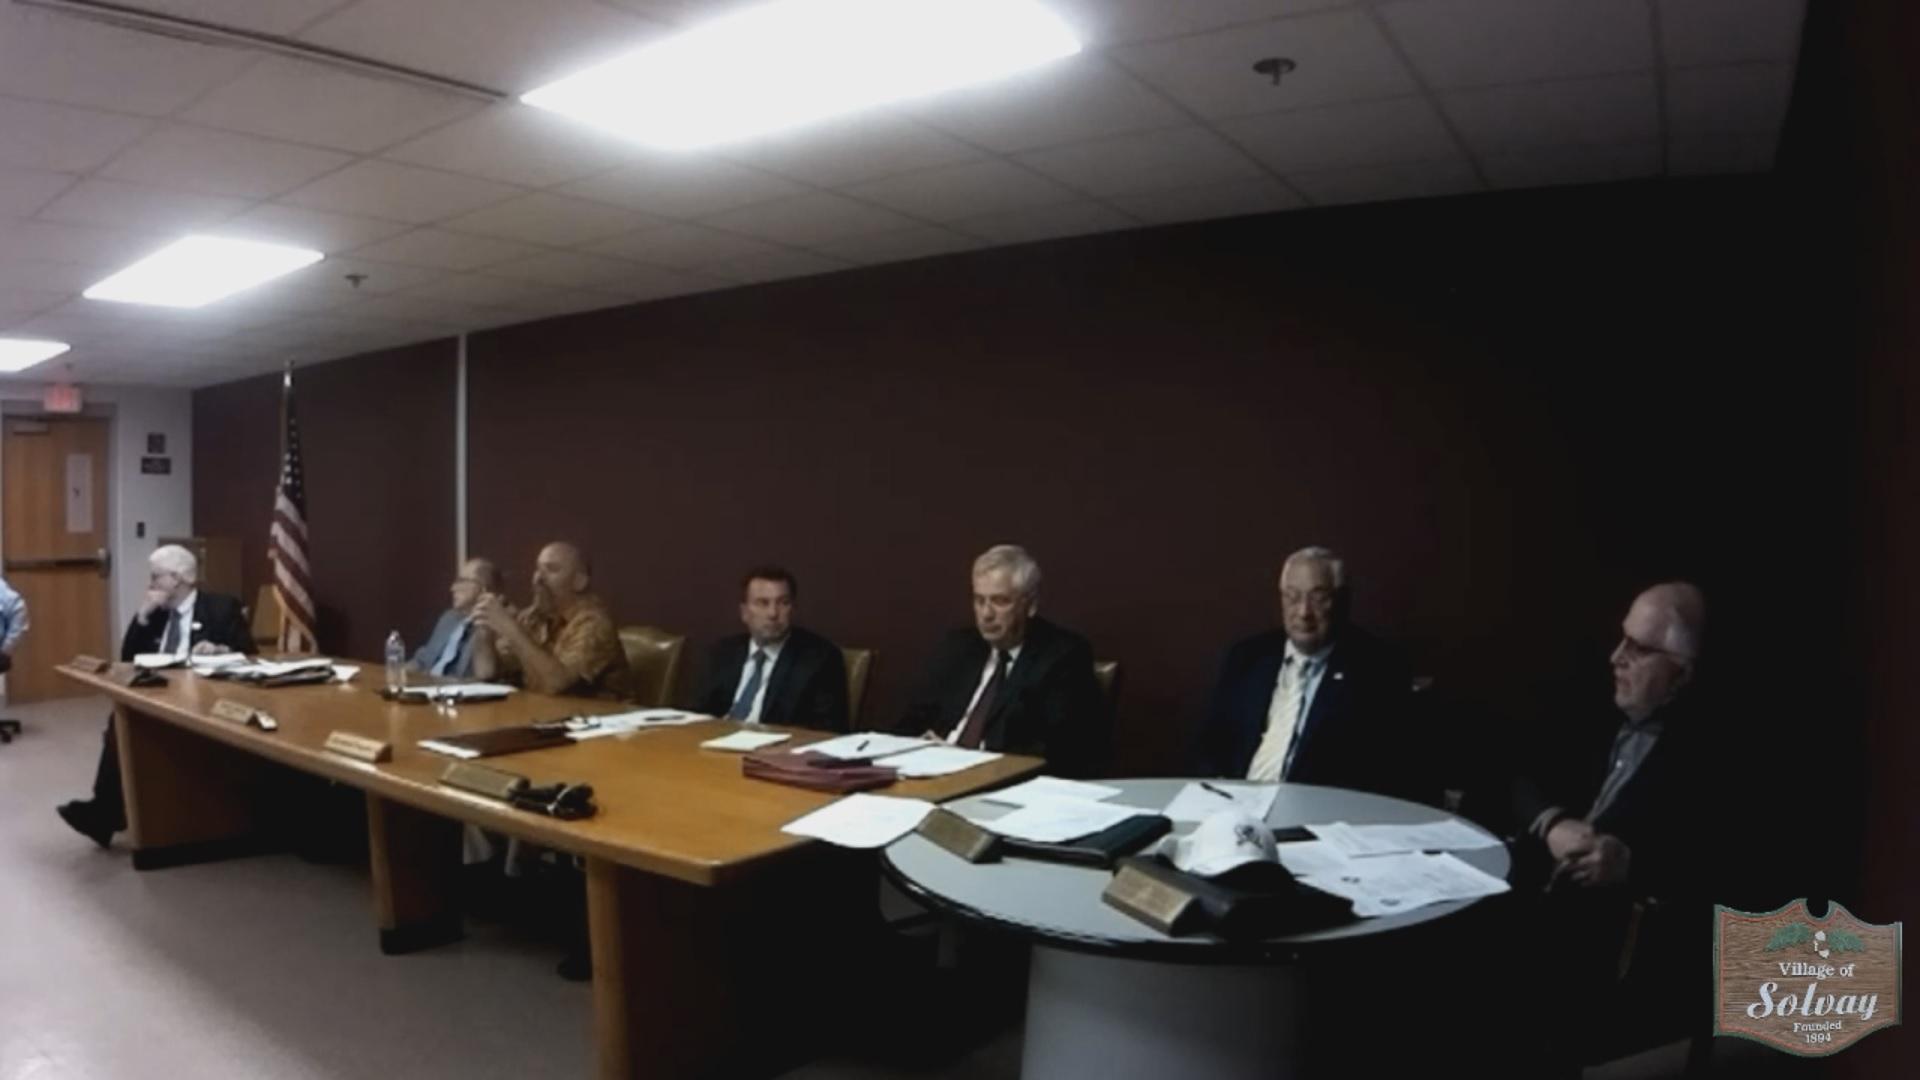 Village of Solvay Regular Board Meeting May 28th 2019